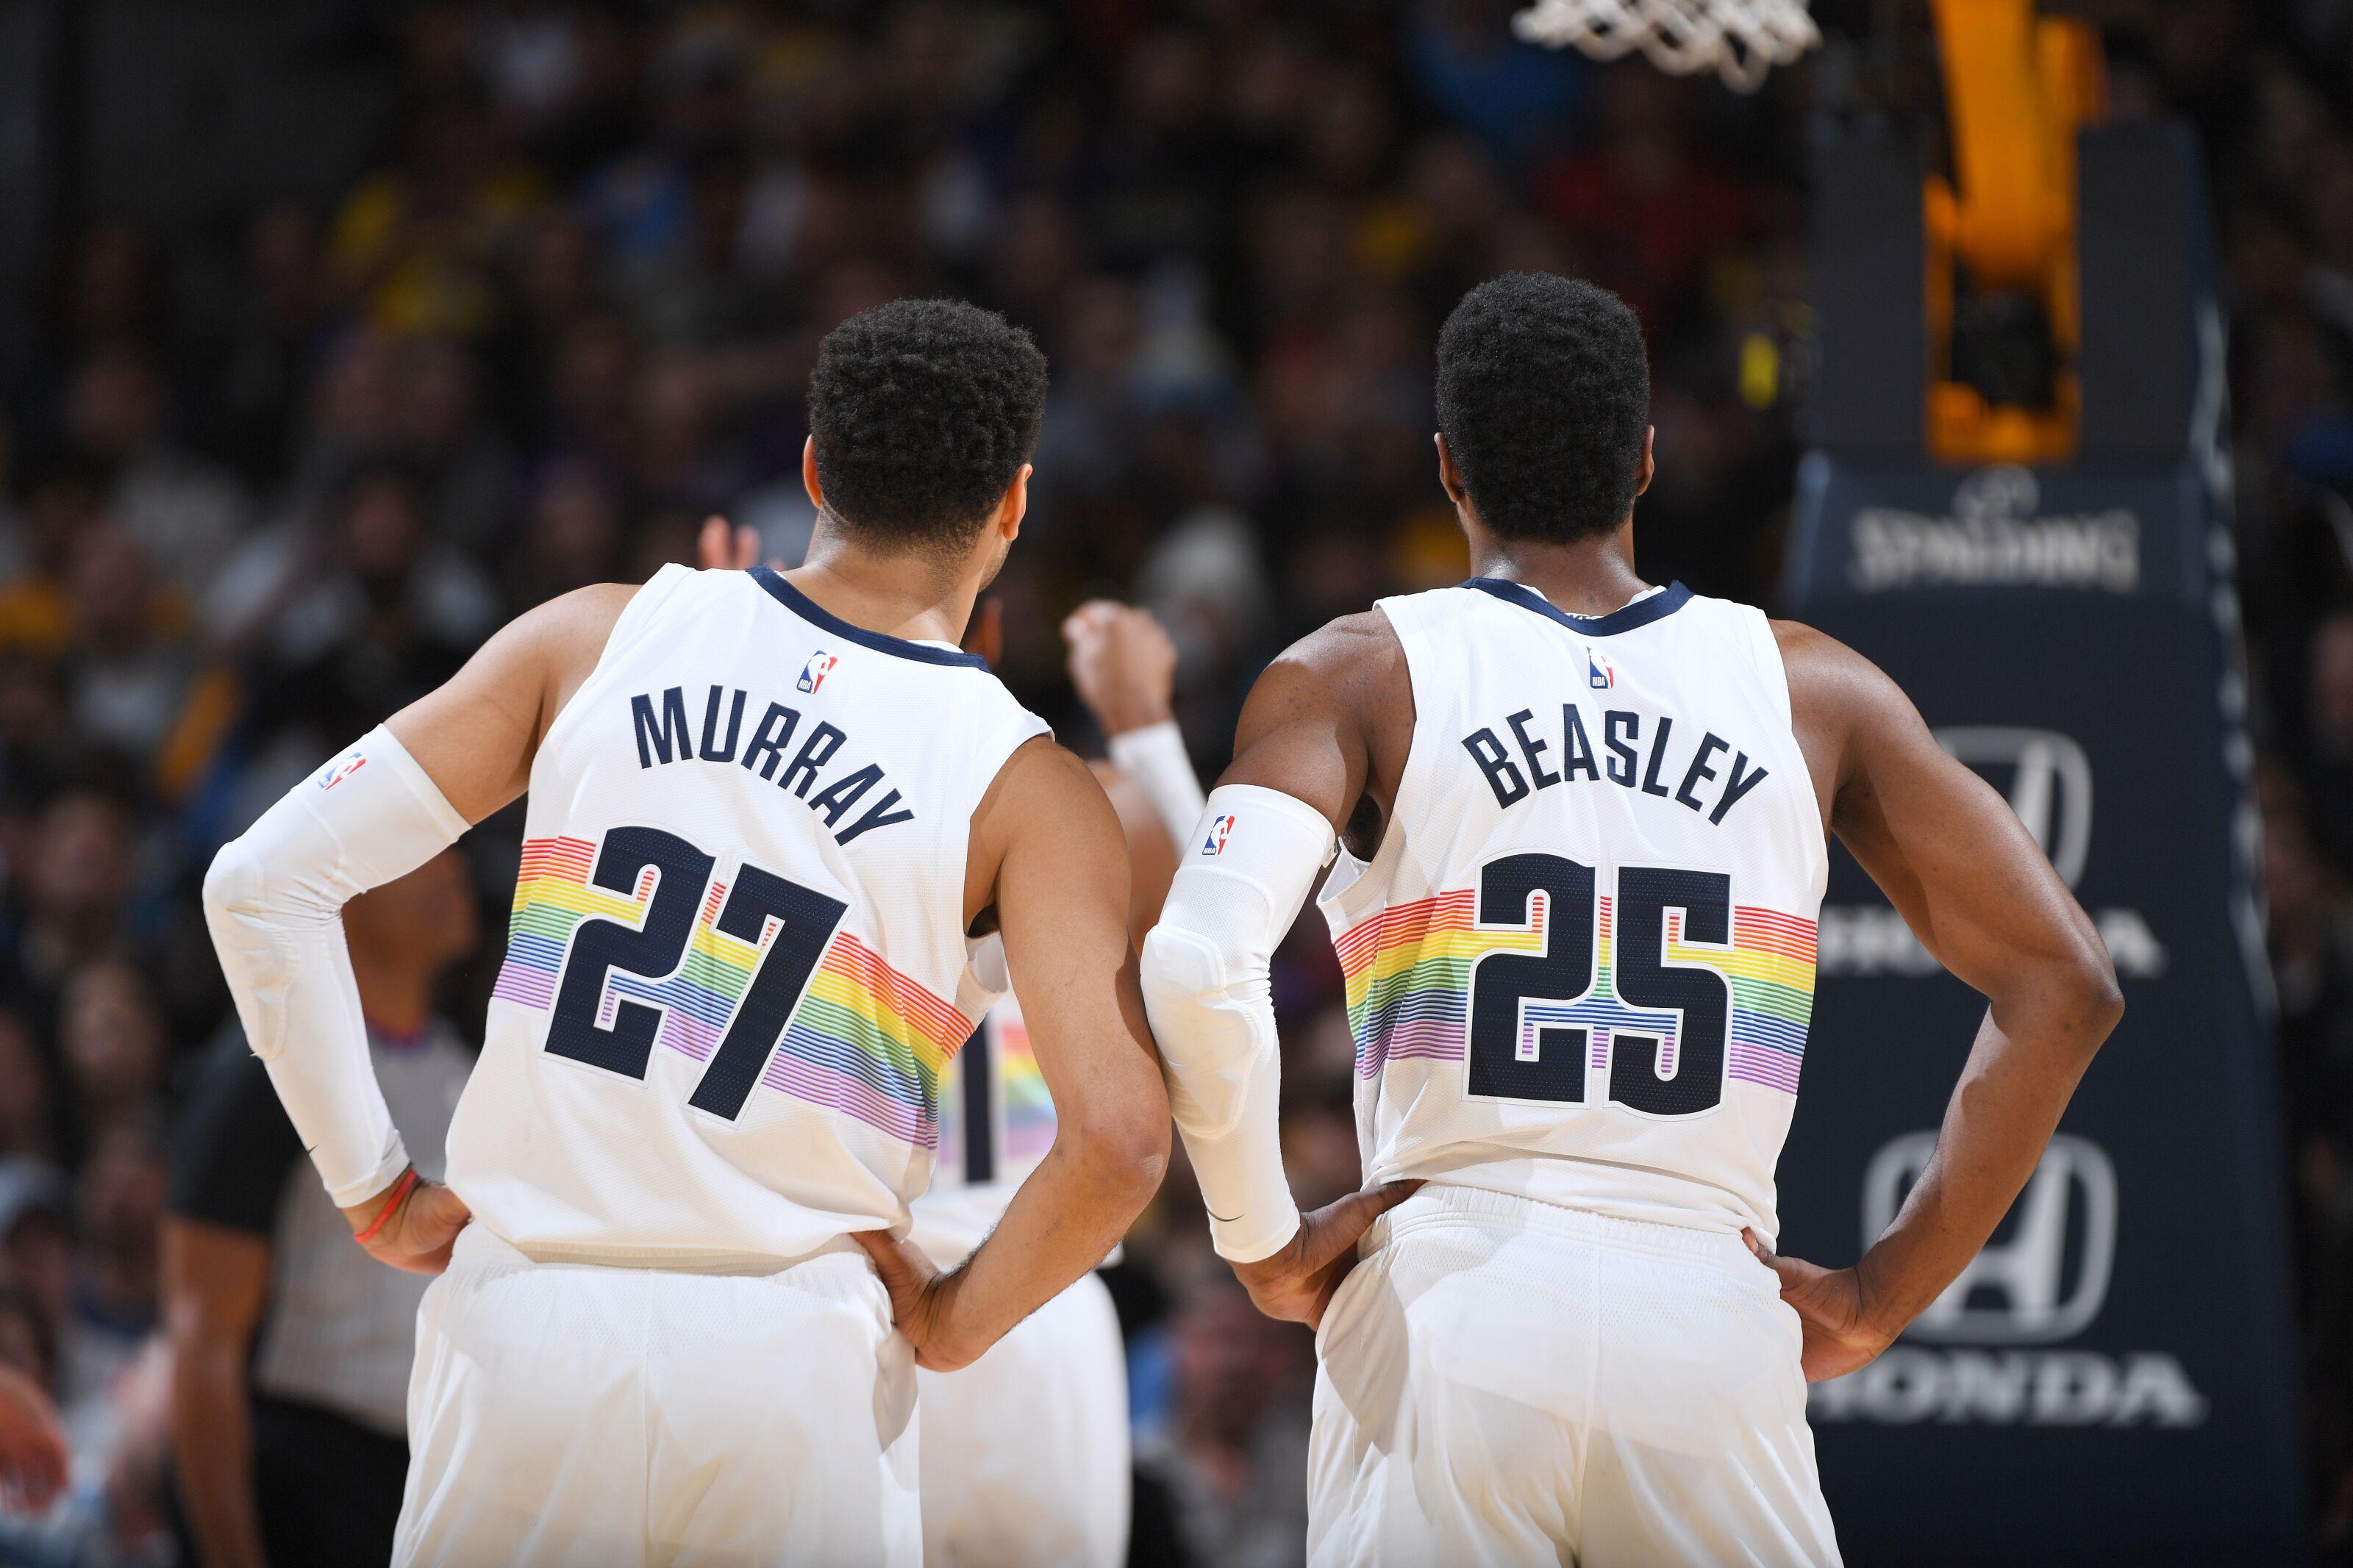 Denver Nuggets vs. Lakers  Player of the game in Denver c1e07e942